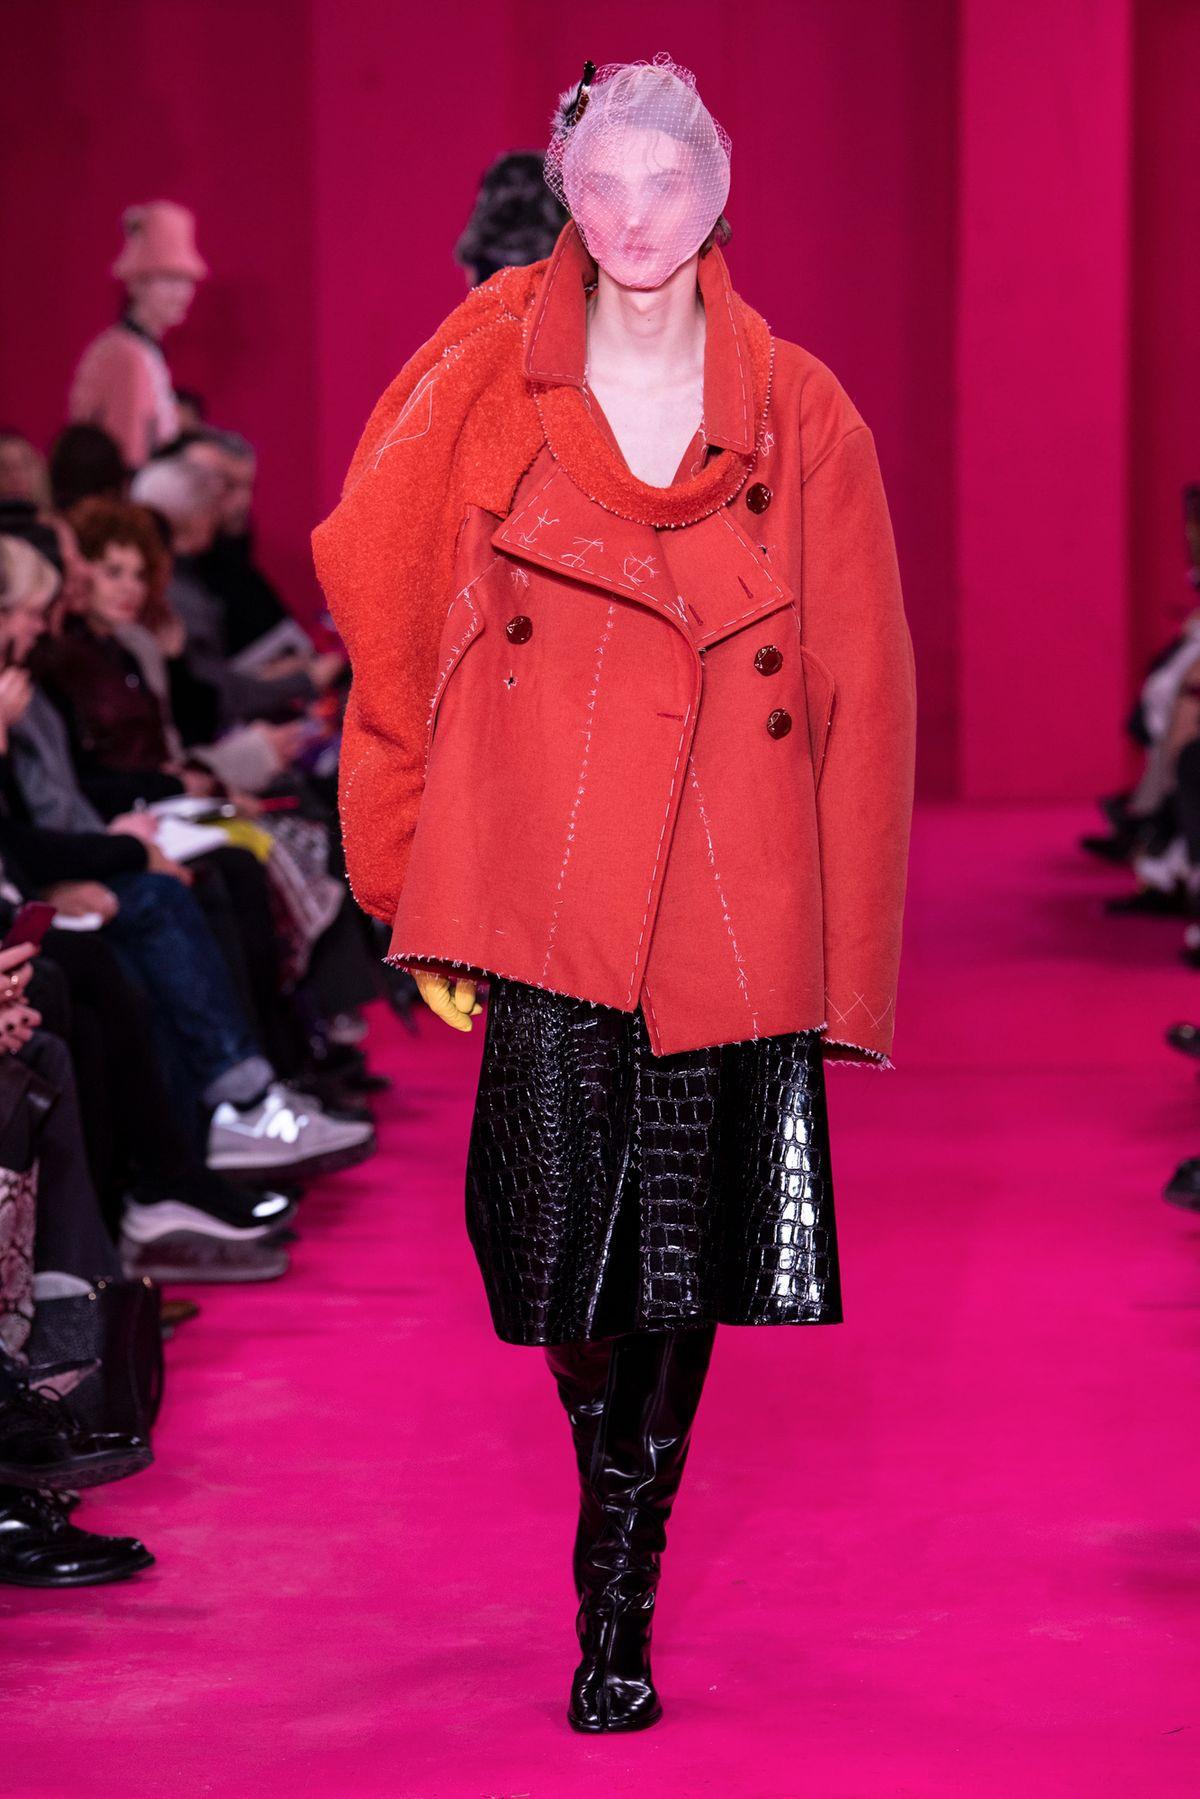 Maison Margiela - Couture Spring/Summer 2020 show in Paris